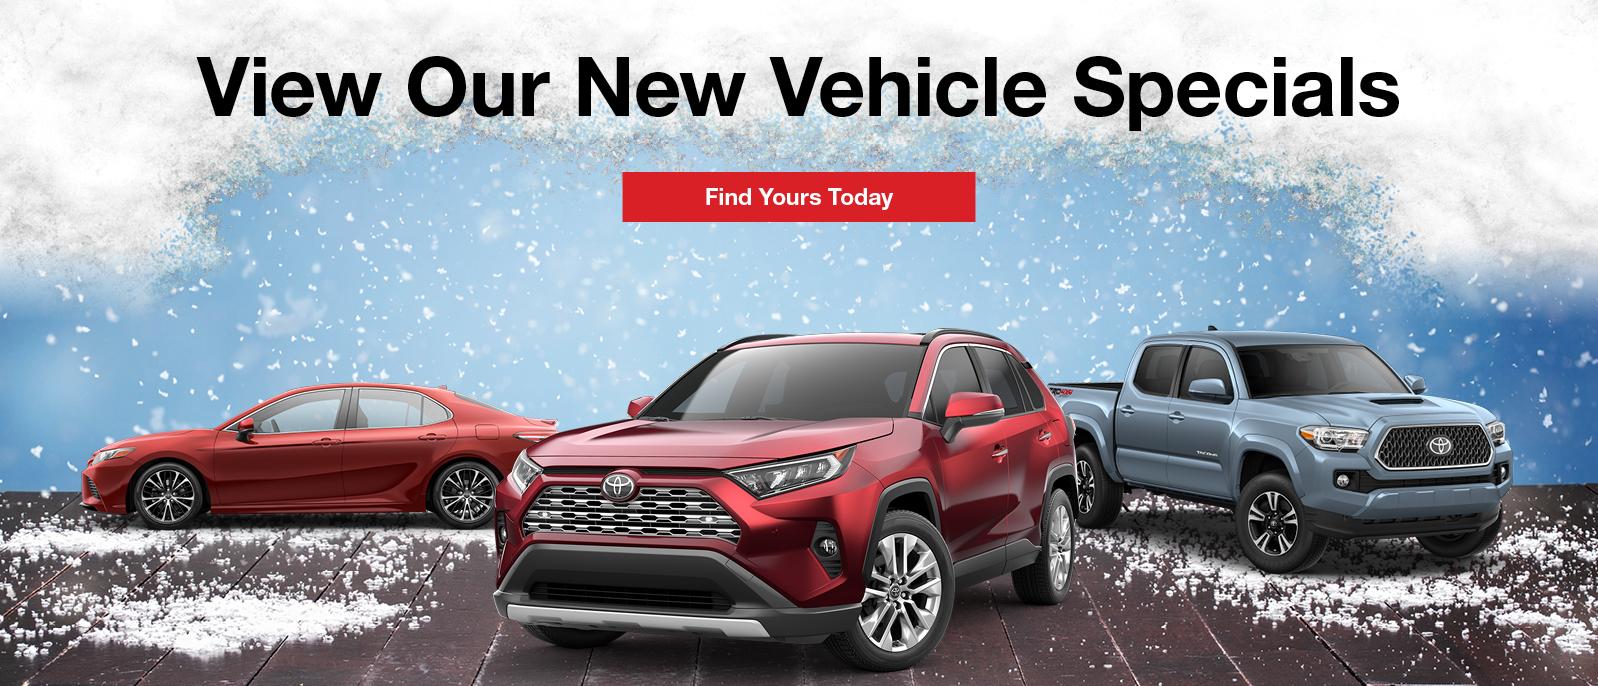 Lakeland Toyota Dealership Near Tampa Selling New Used Cars